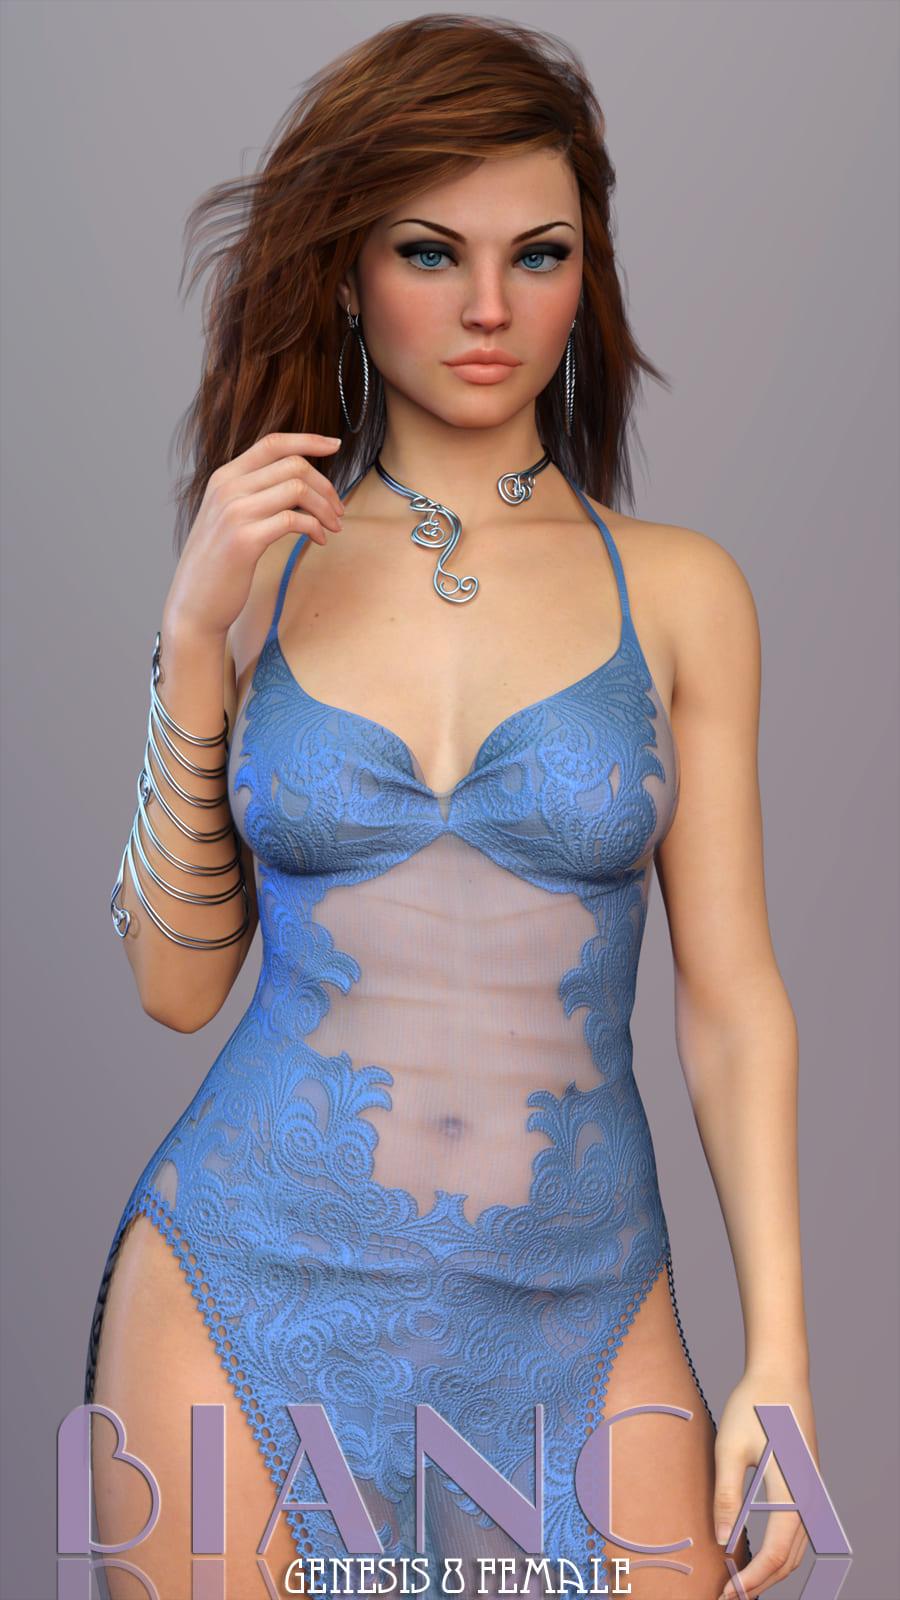 Bianca For Genesis 8 Female_DAZ3D下载站